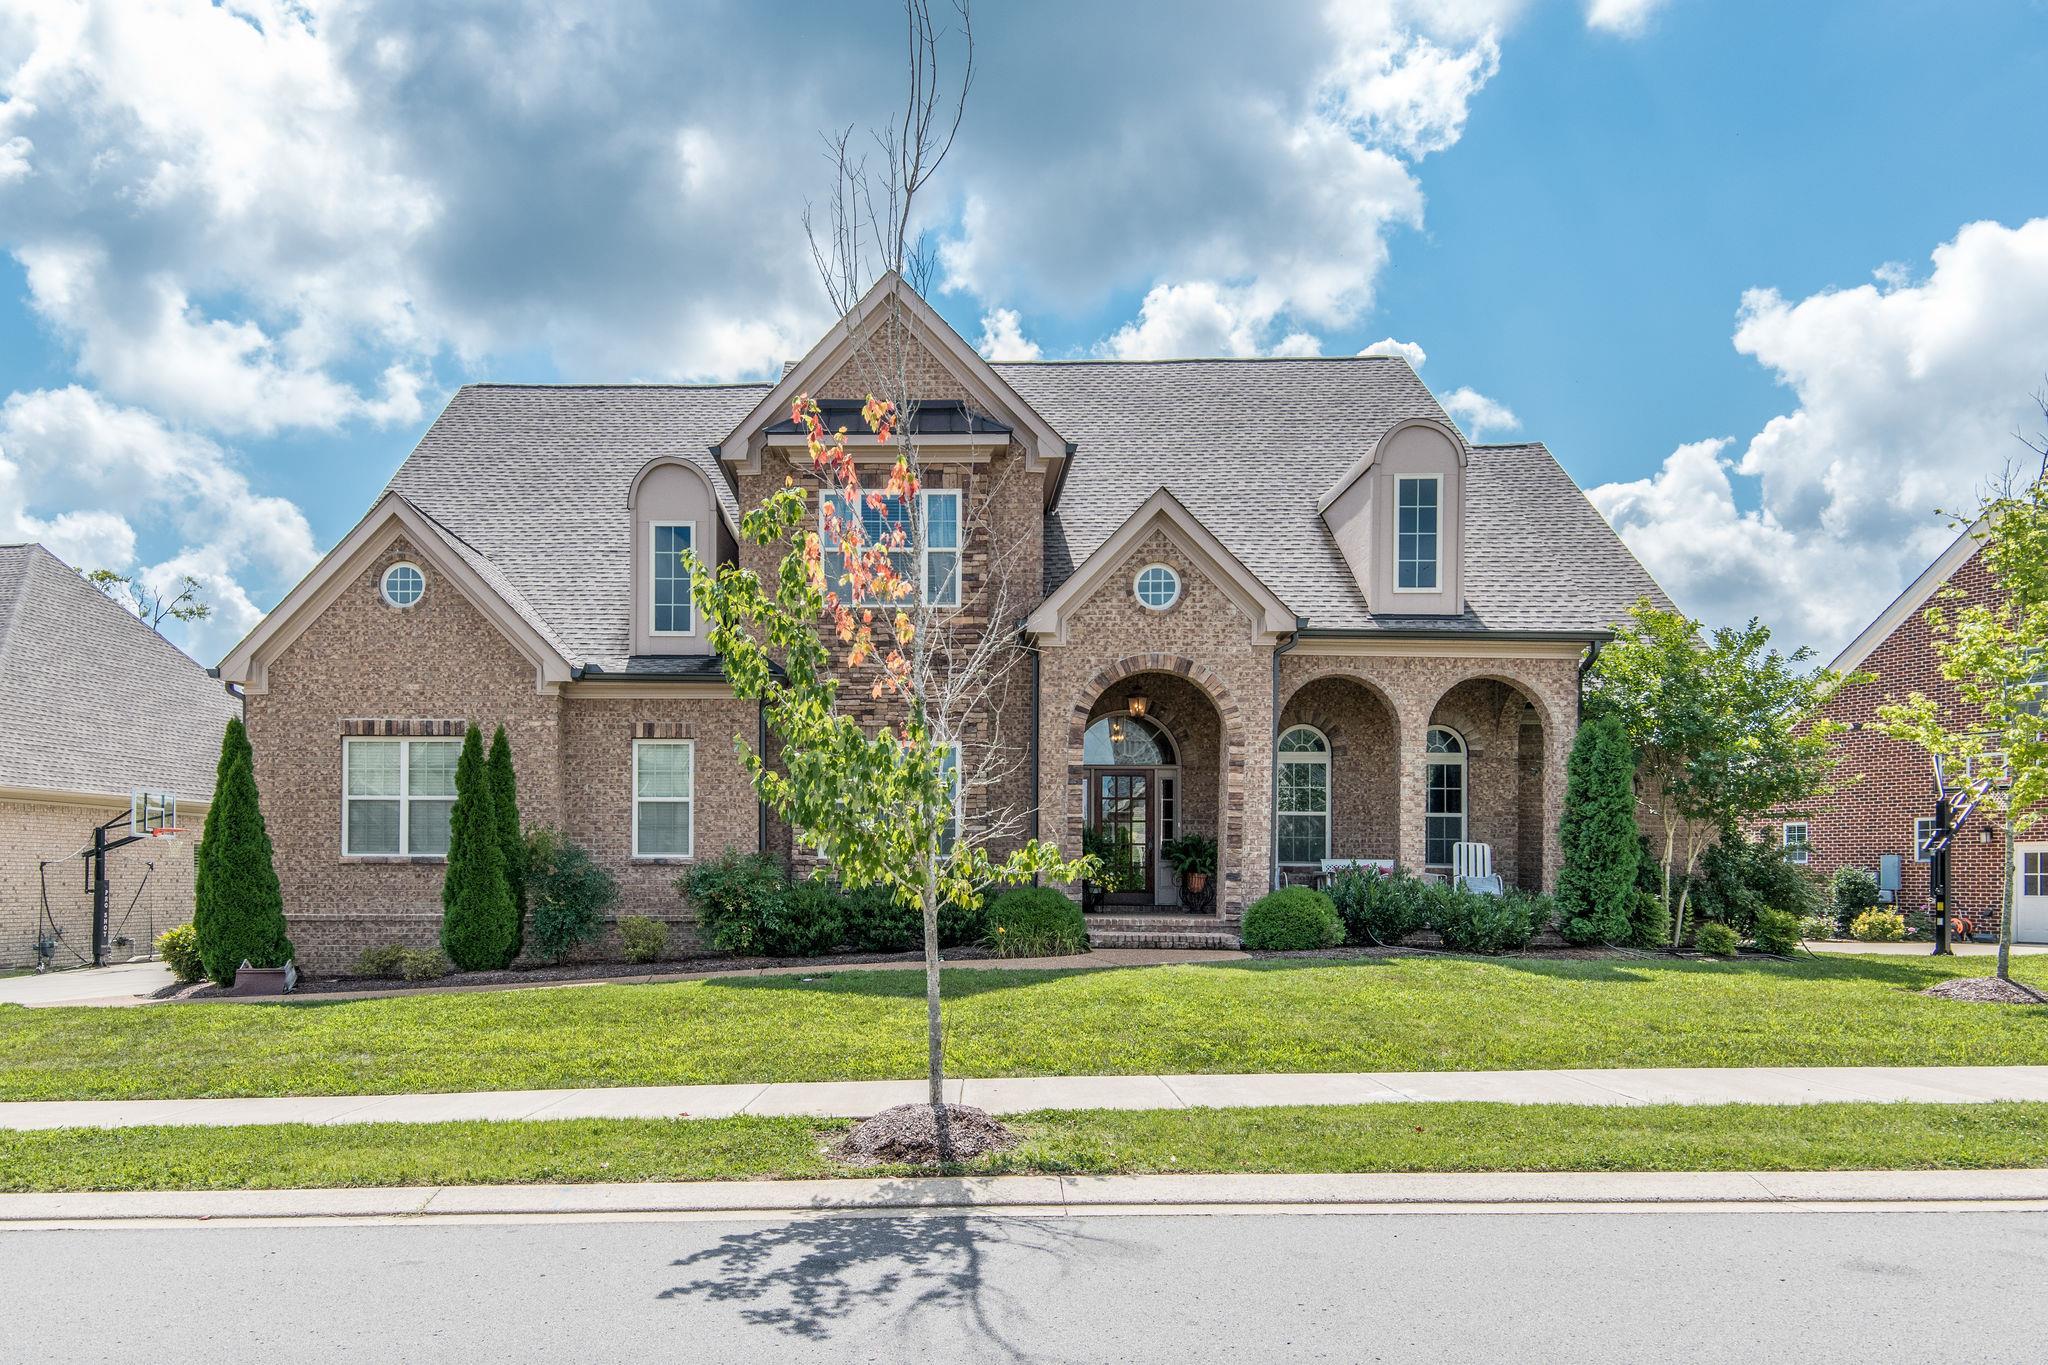 2208 Dunblane Ln, Franklin, TN 37069 - Franklin, TN real estate listing